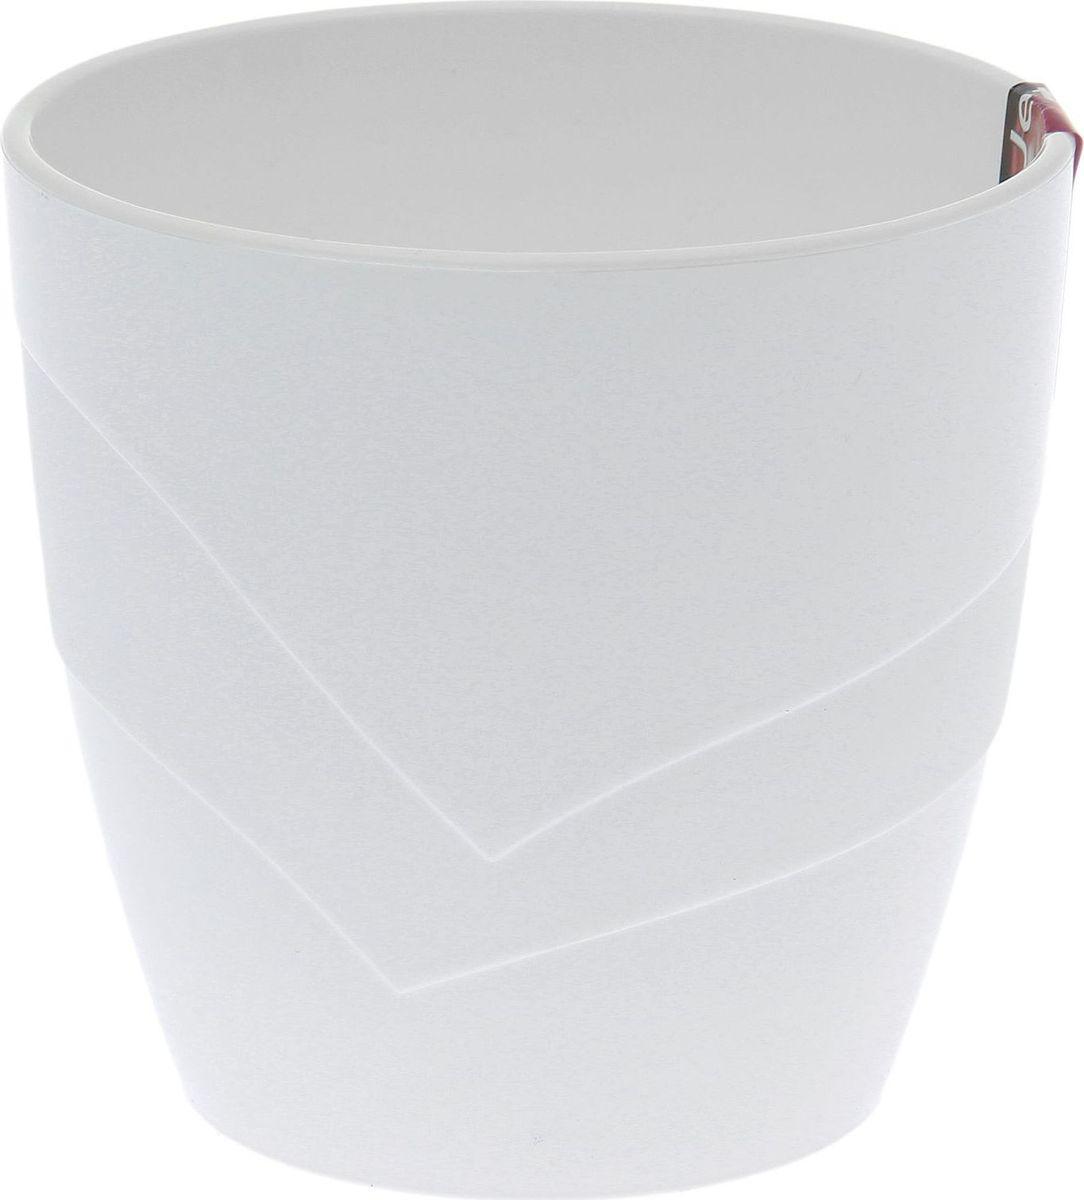 Кашпо JetPlast Грация, цвет: белый, 1,2 л1694303